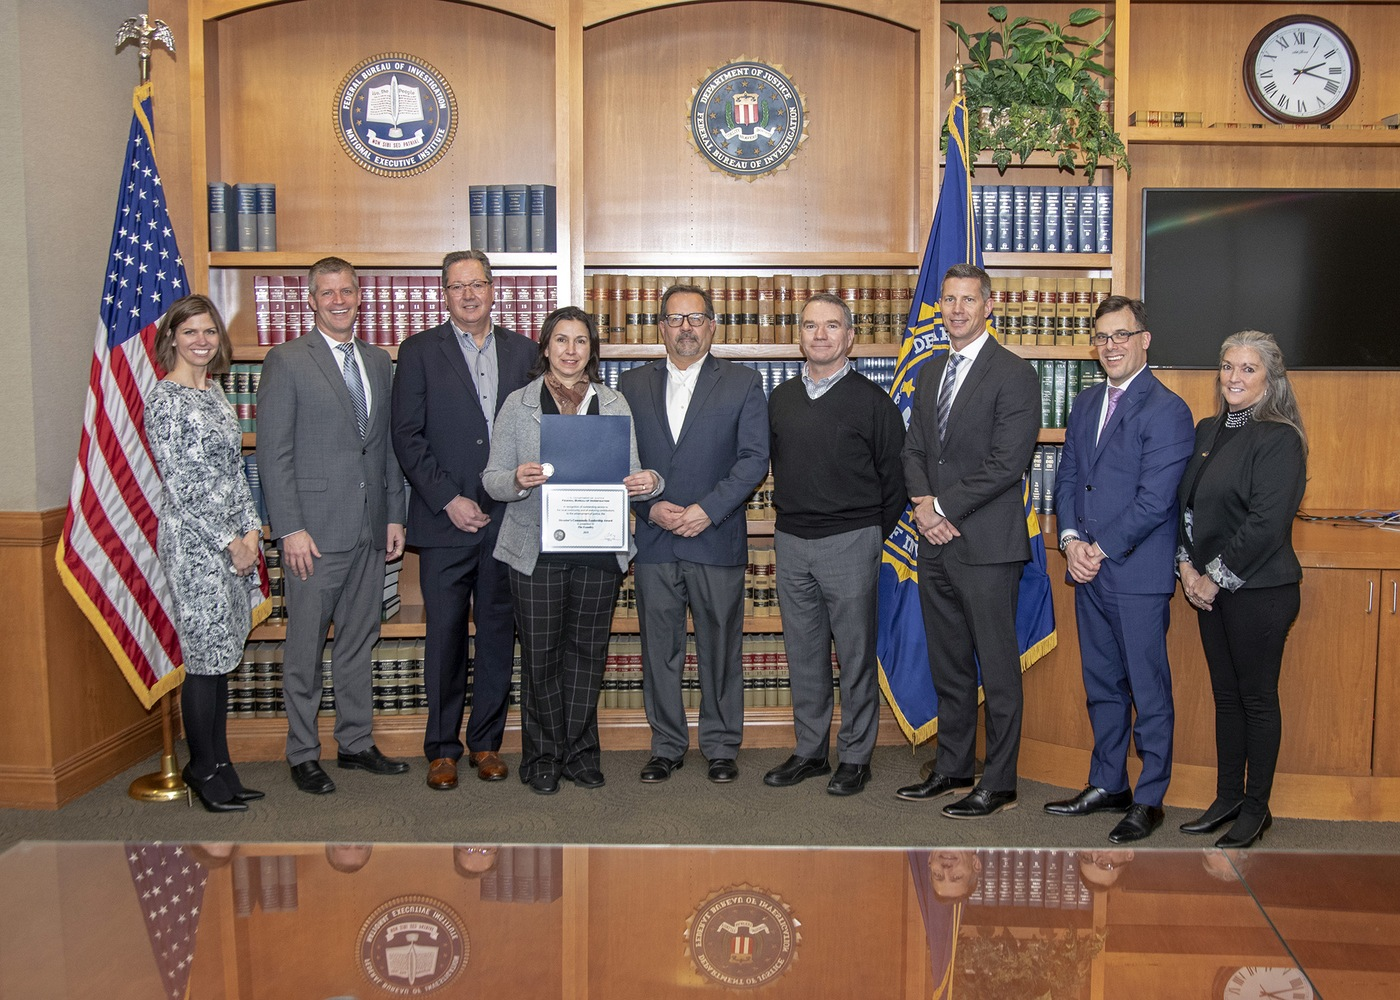 FBI Cleveland 2019 Director's Community Leadership Award recipient The Foundry.